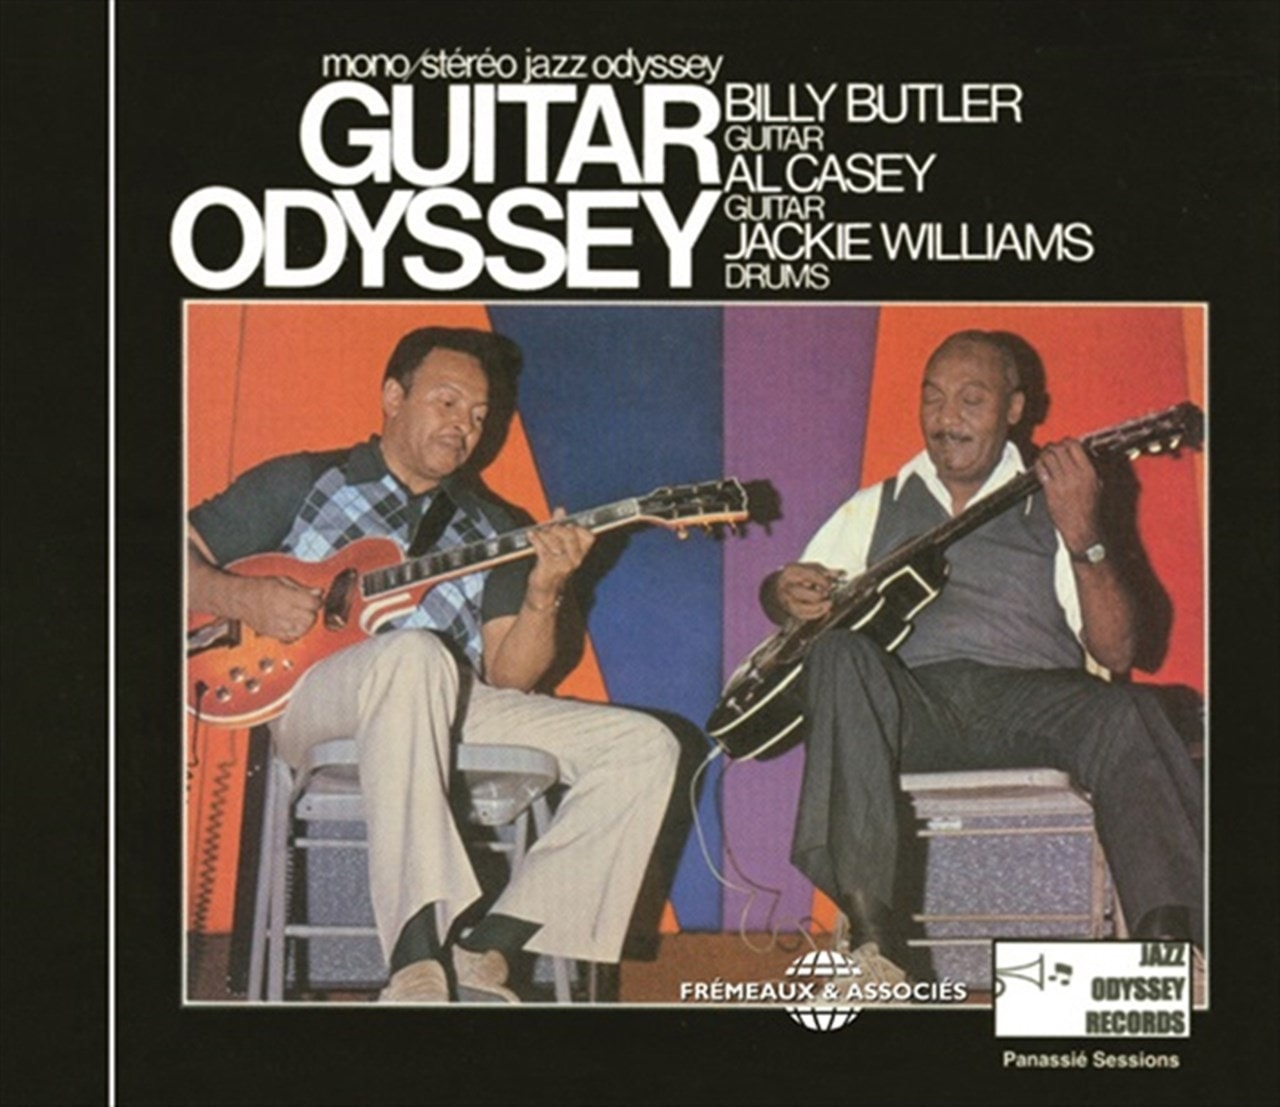 Guitar Odyssey - 1